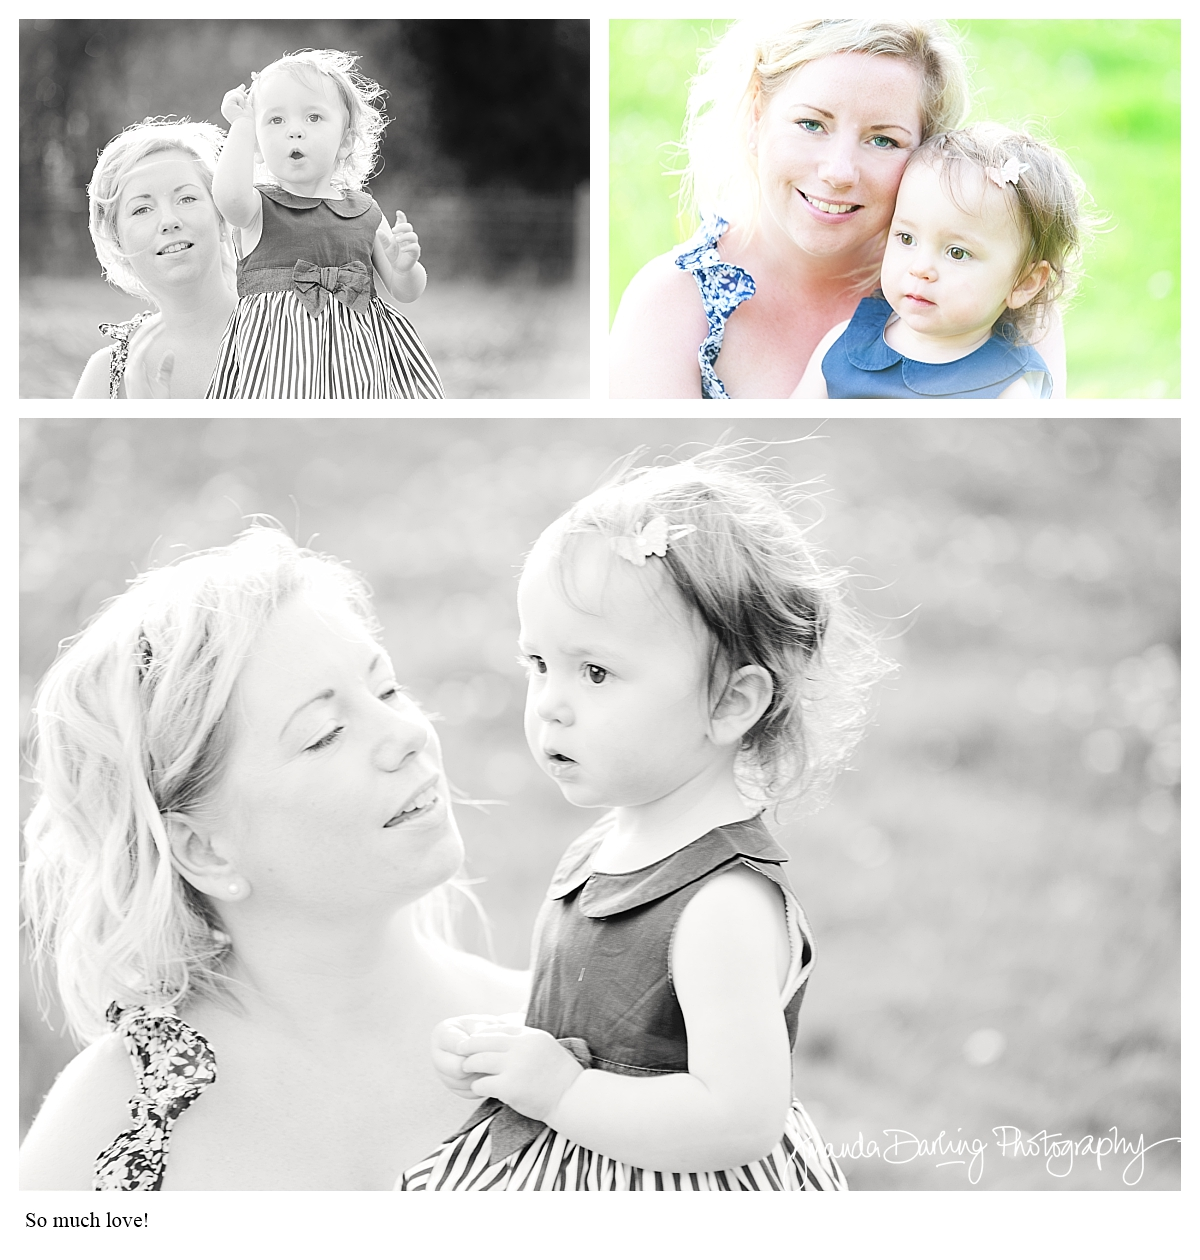 natural-mother-and-daughter-photography-surrey-Amanda-Darling